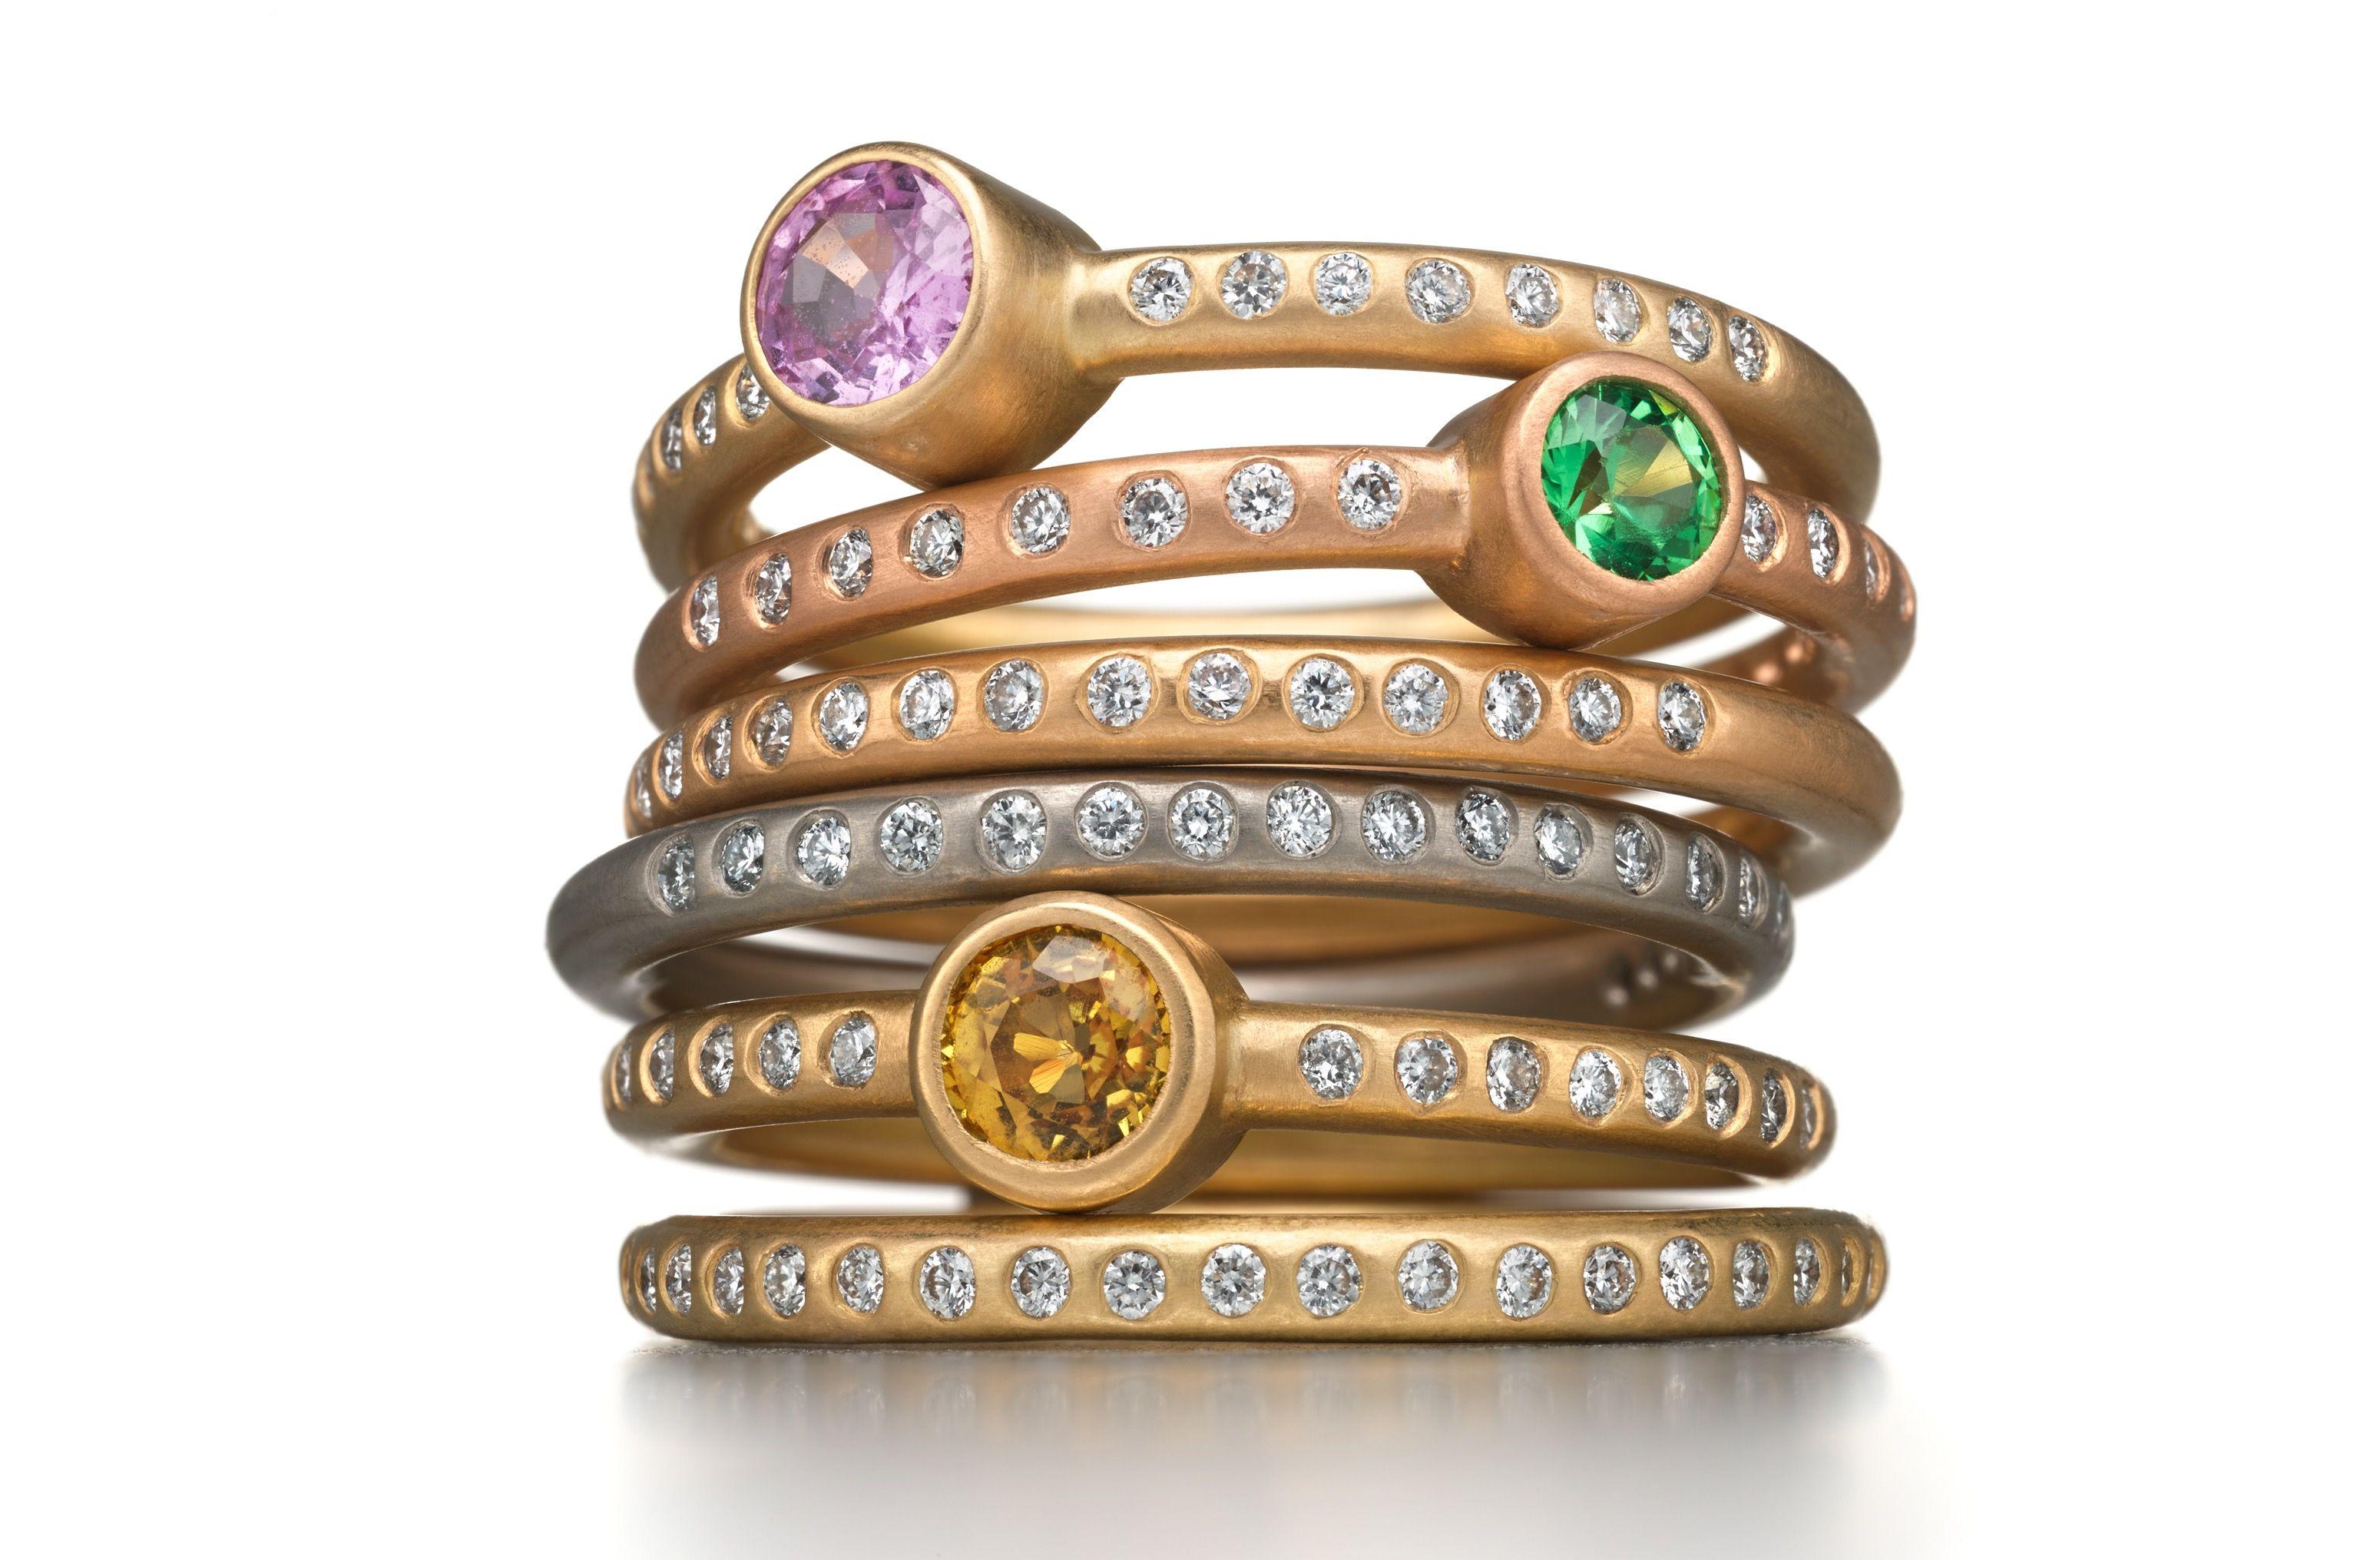 JewelryWhite_33.jpg